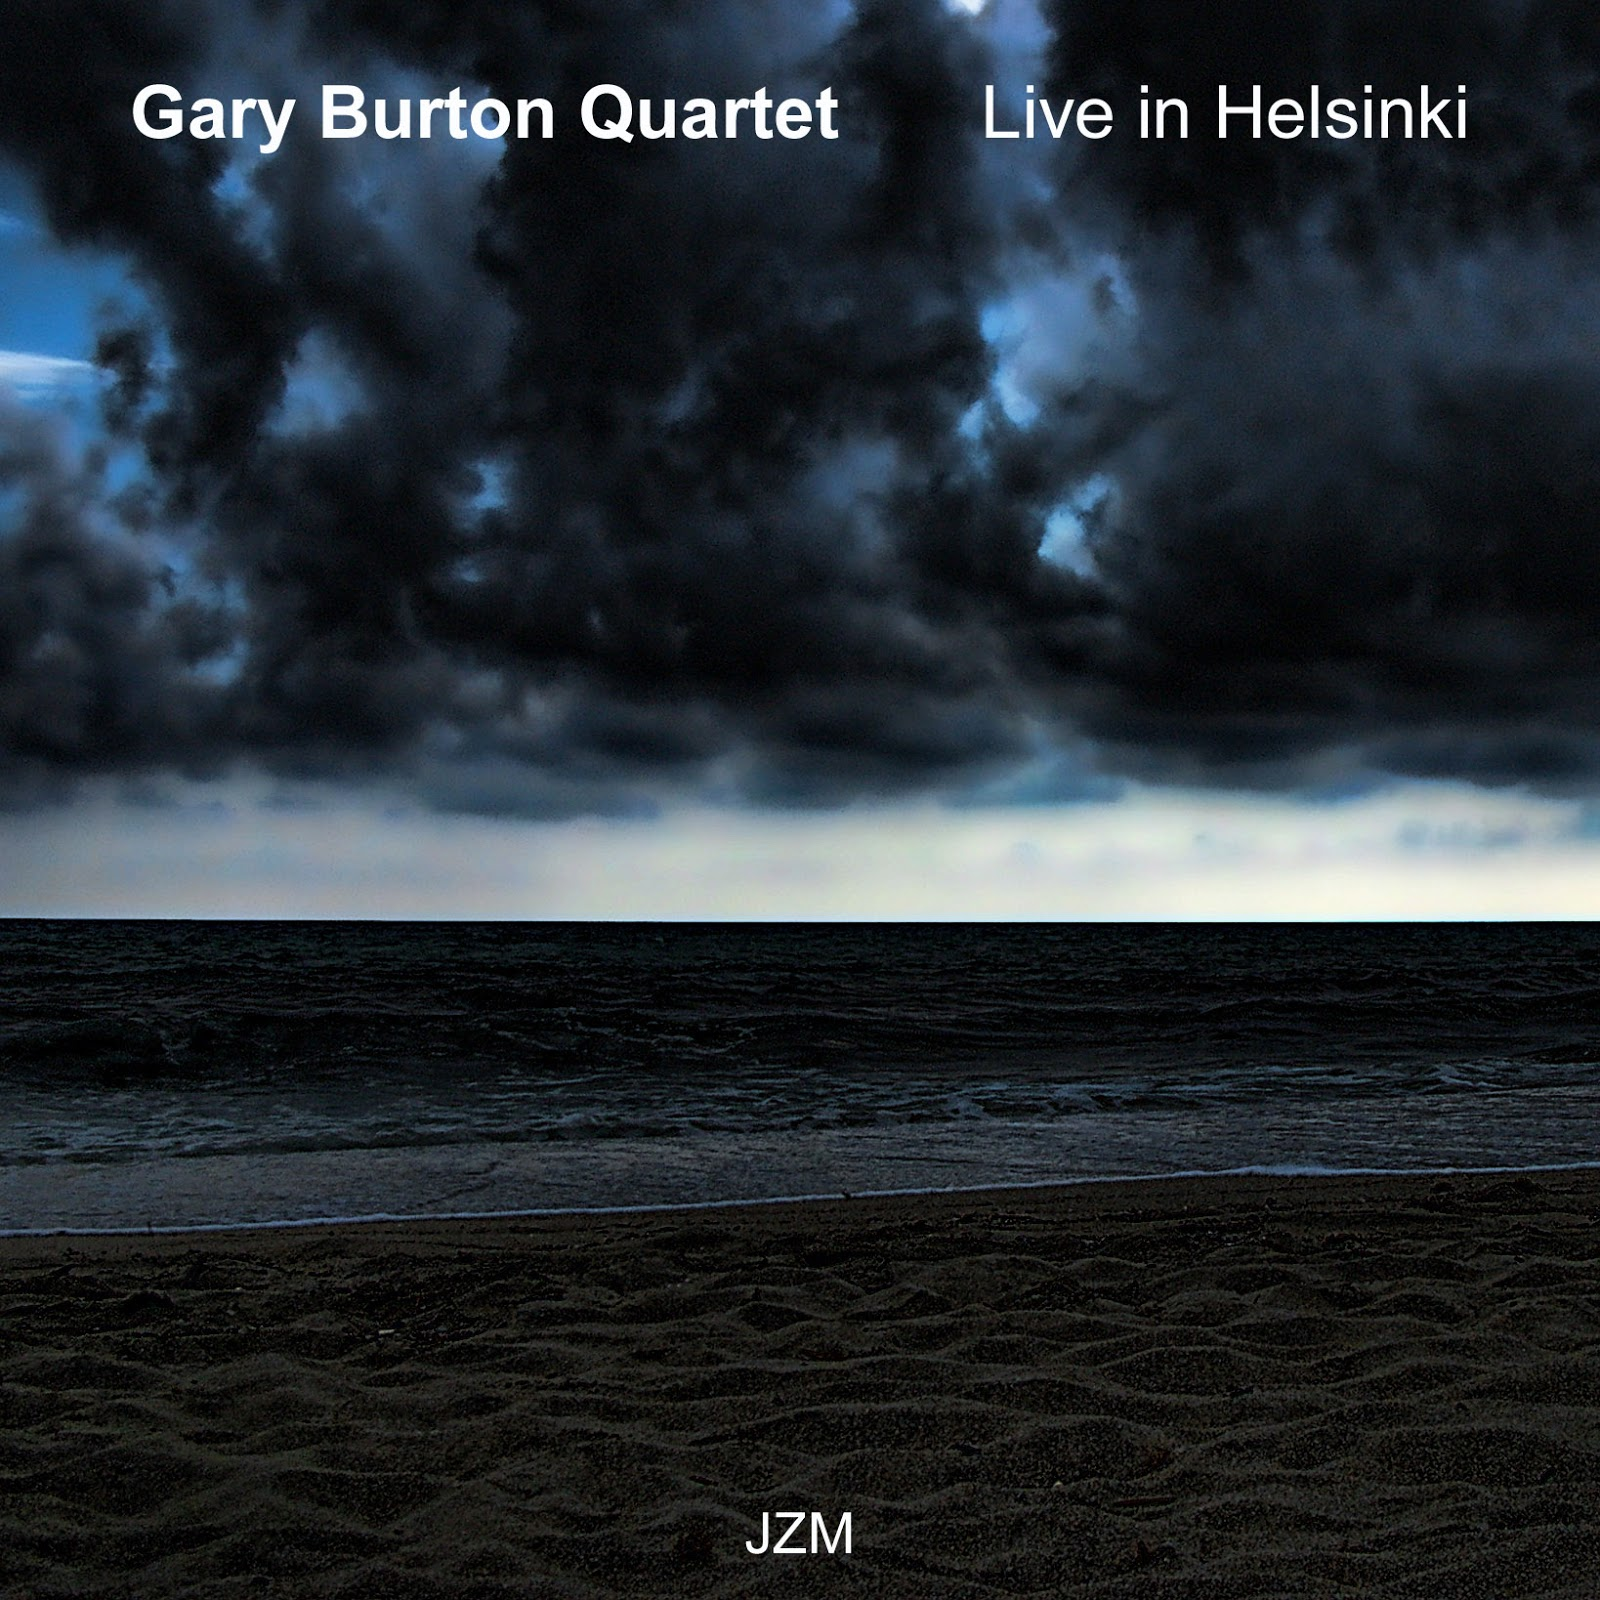 Gary Burton Quartet The Gary Burton Quartet With Eberhard Weber Passengers